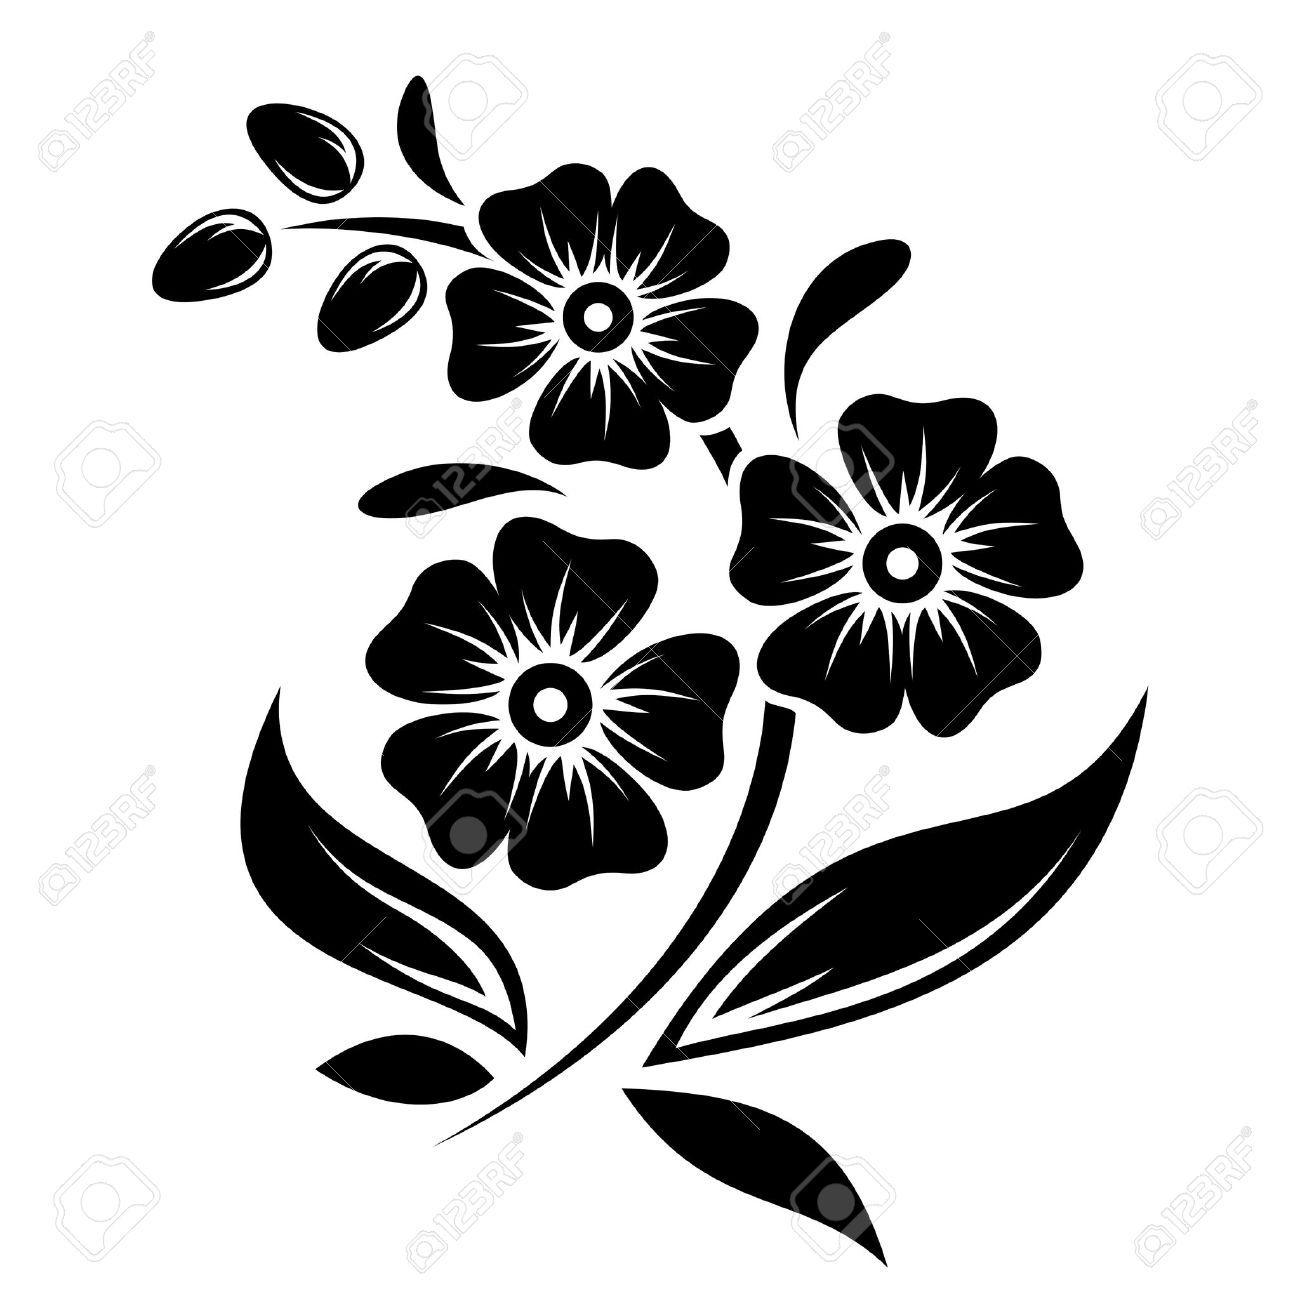 Flower vector graphics clipart. Stock vinyl silhouette flowers